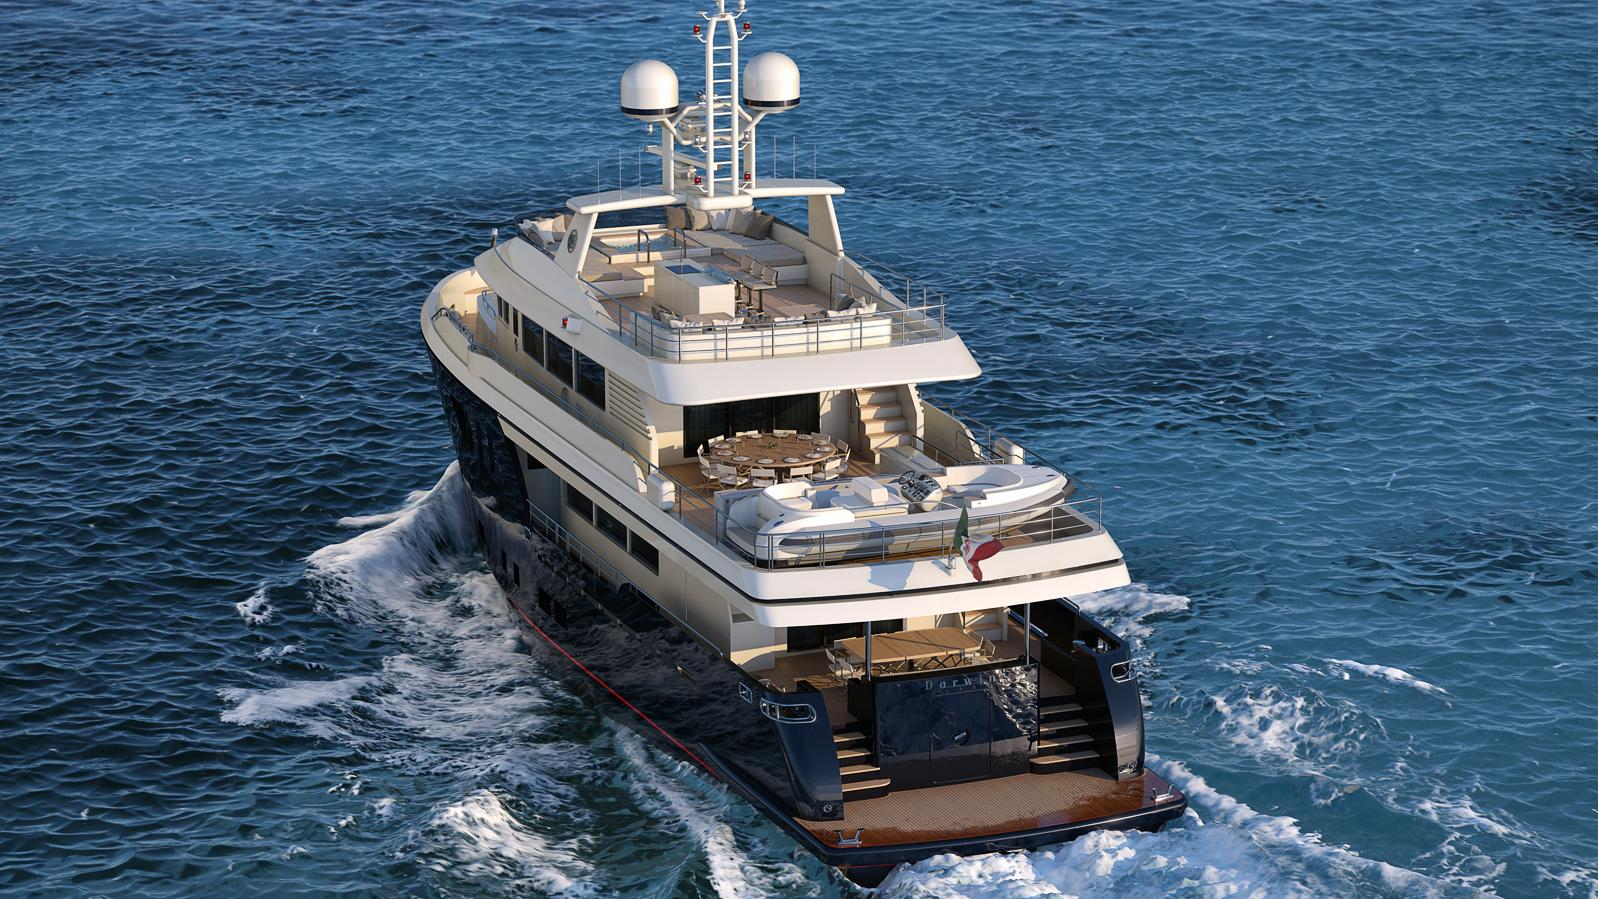 babbo-motor-yacht-cantiere-delle-marche-darwin-102-2016-31m-cruising-stern-rendering